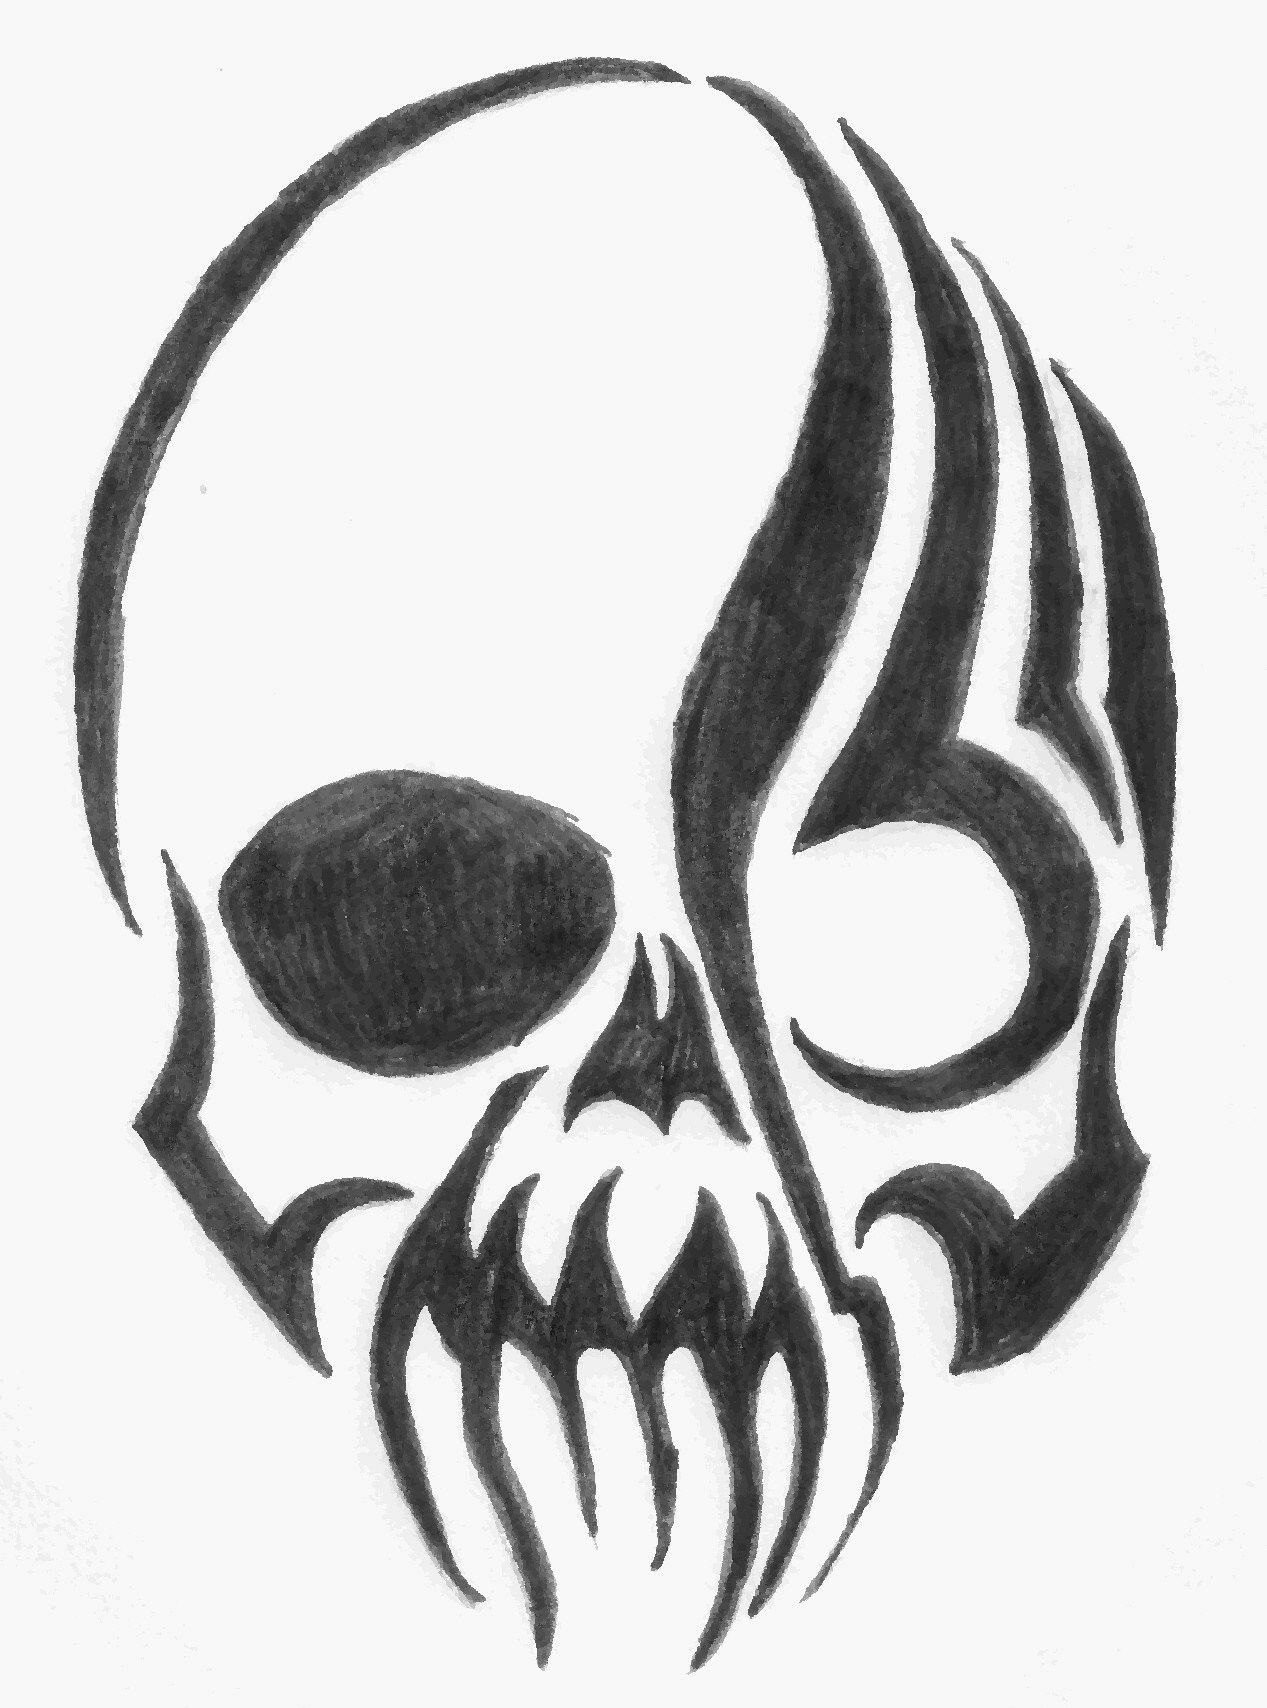 Pin by linda b on patterns cool skull drawings easy skull drawings cool drawings